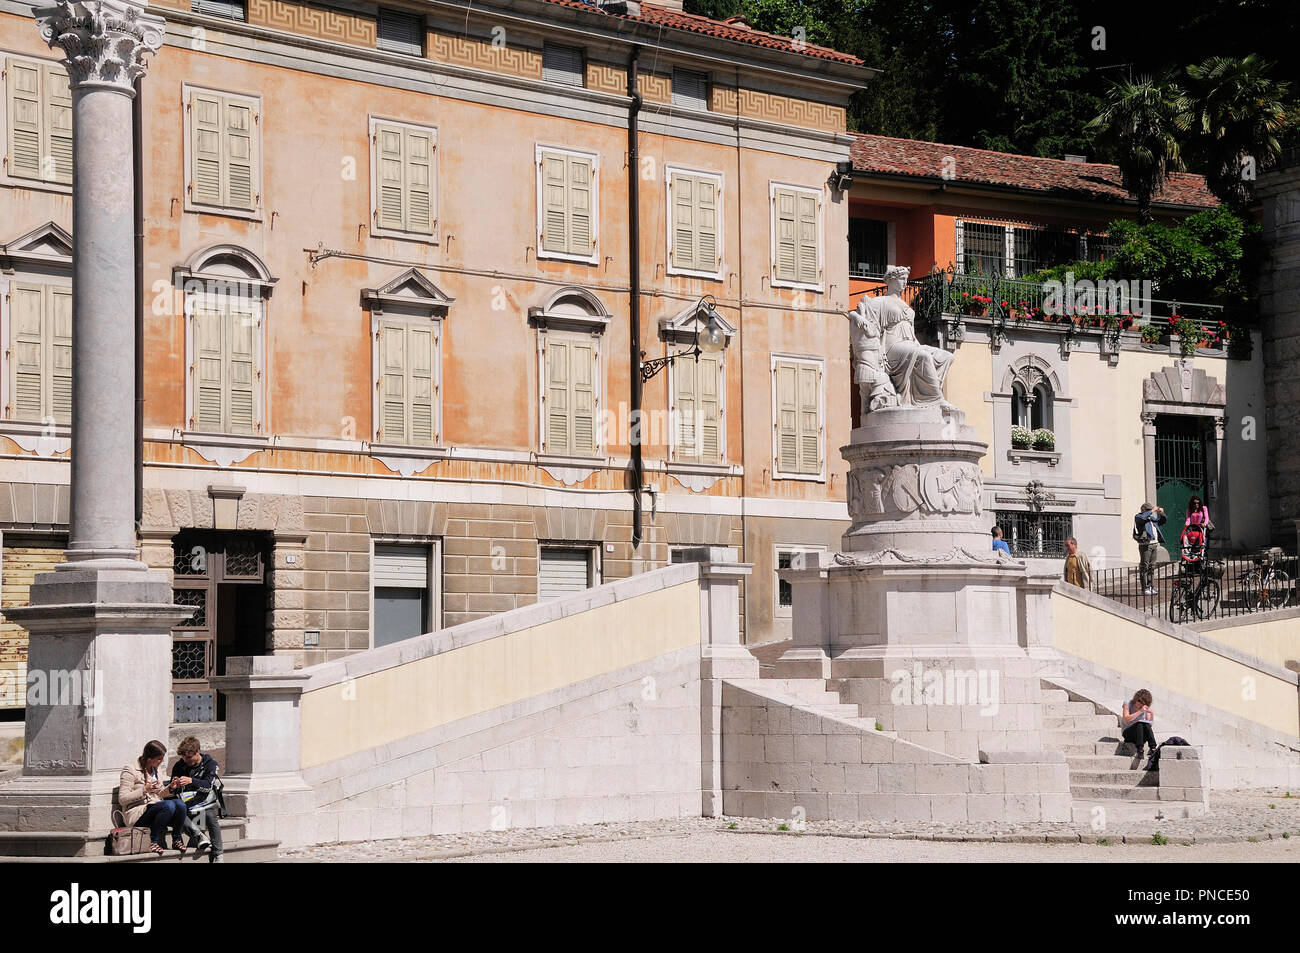 Italy, Friuli Venezia Giulia, Udine, Piazza Liberta. - Stock Image